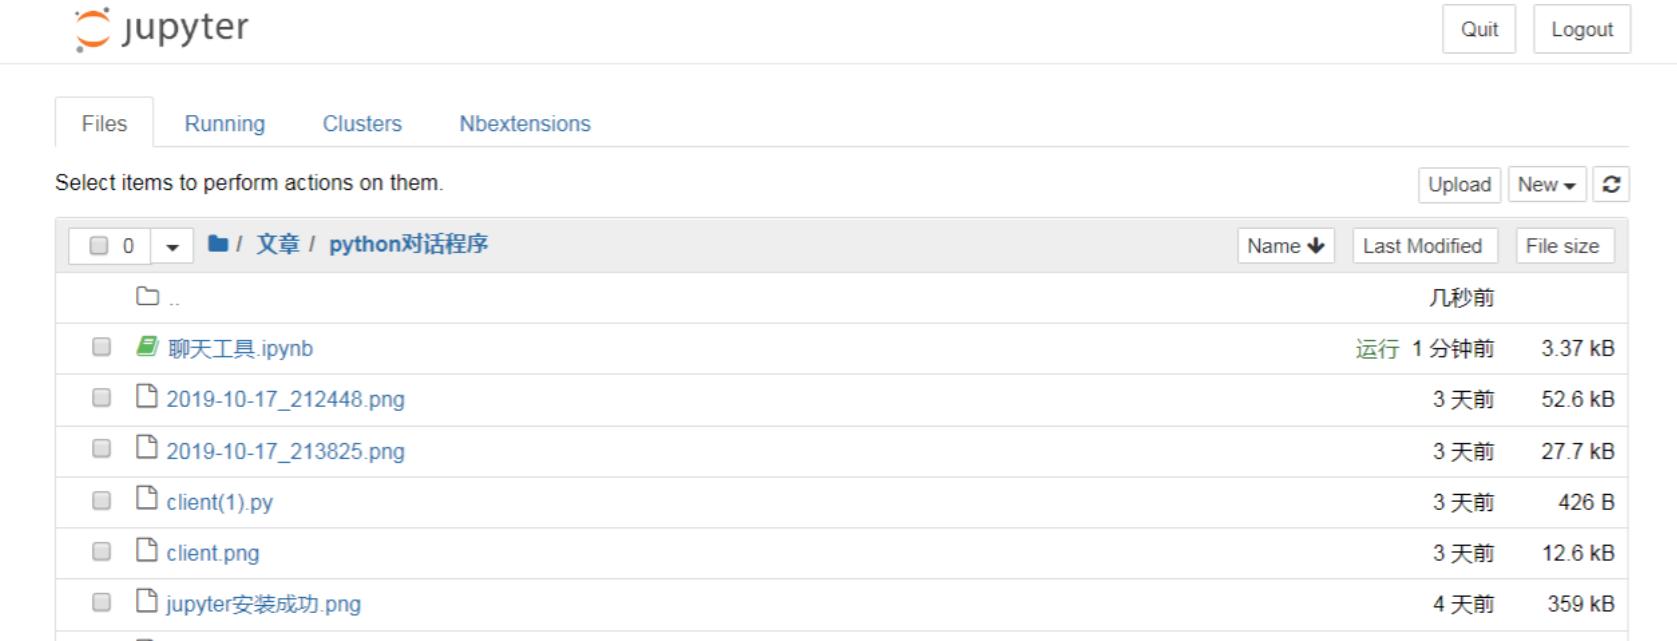 python界面开发工具哪个好?